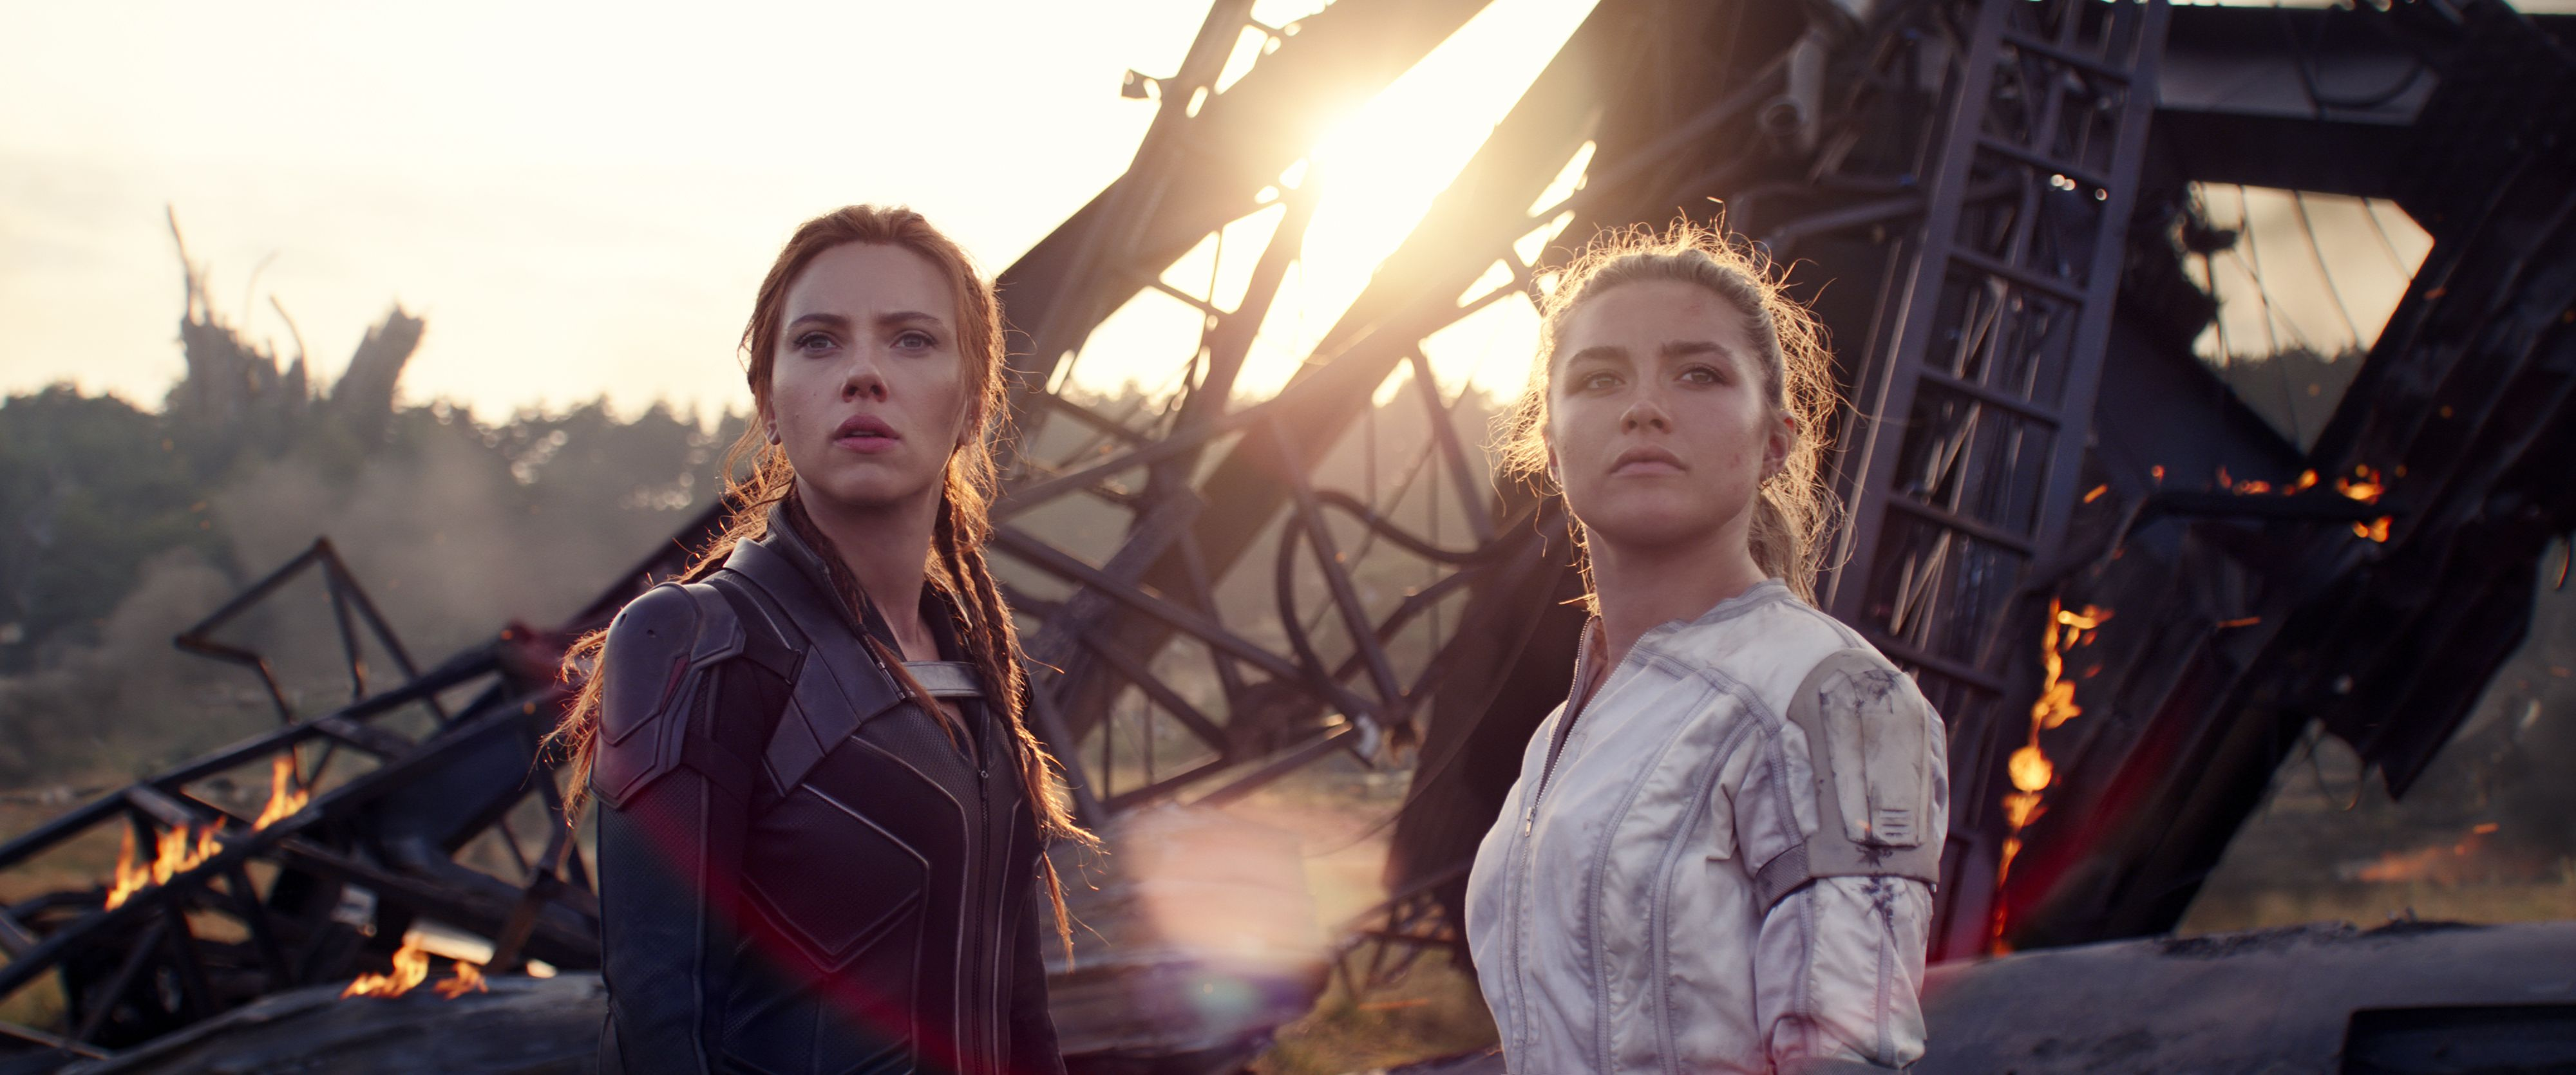 Black Widow ScreenX Poster Is an Immersive Look Into Natasha's Classified Past